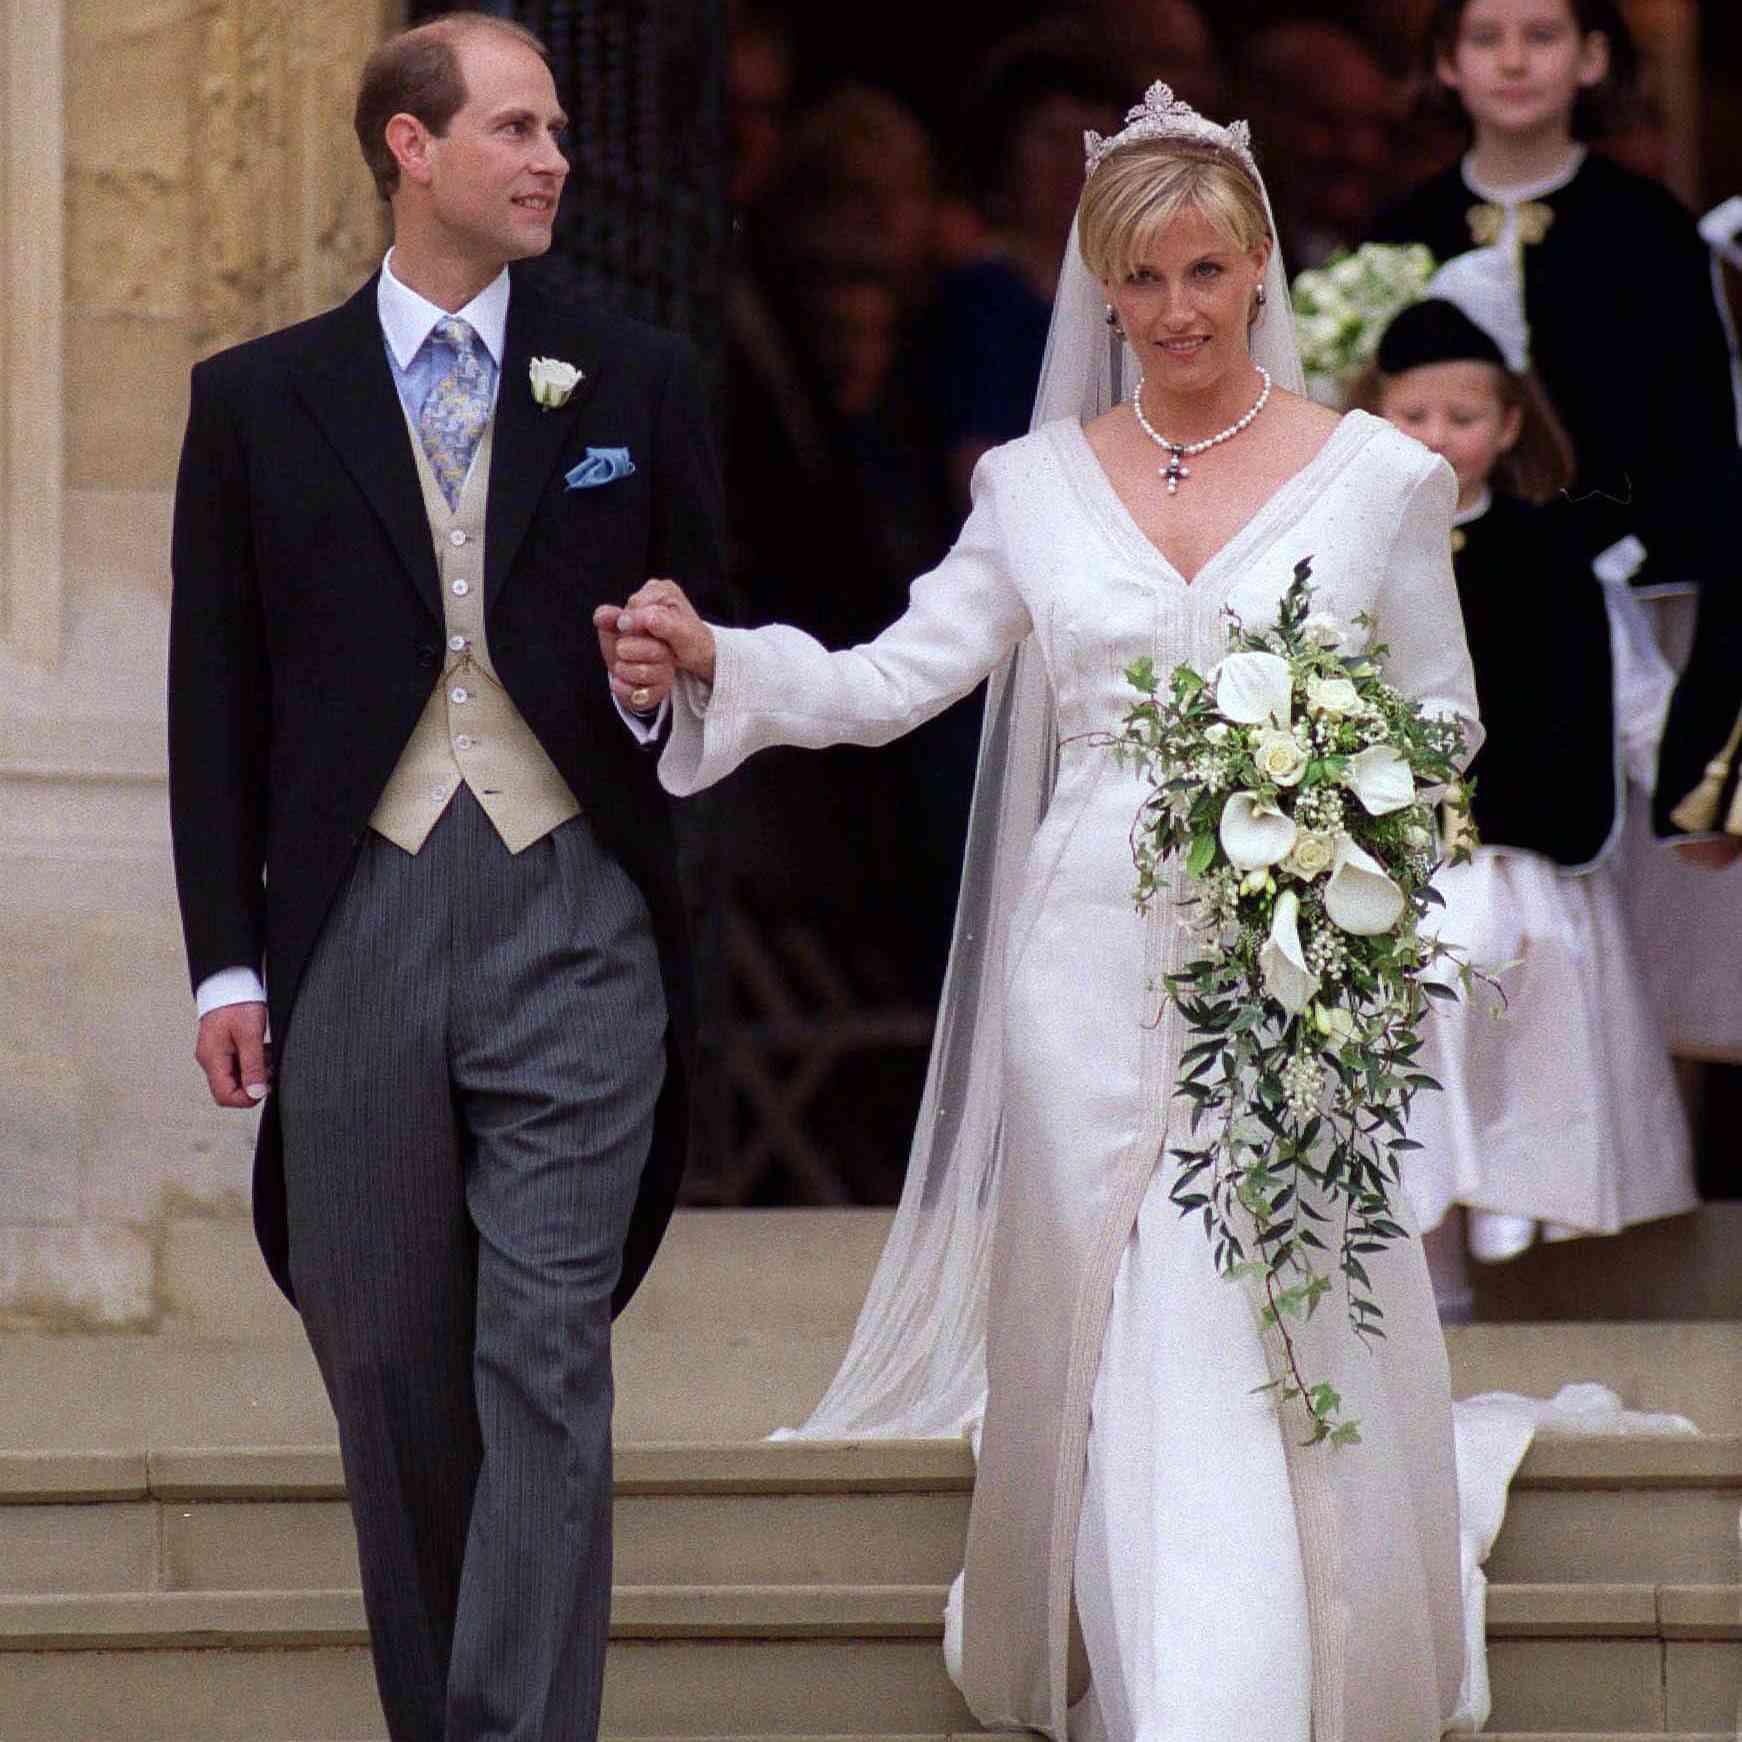 Prince Edward And Sophie Rhys-Jones on their wedding day